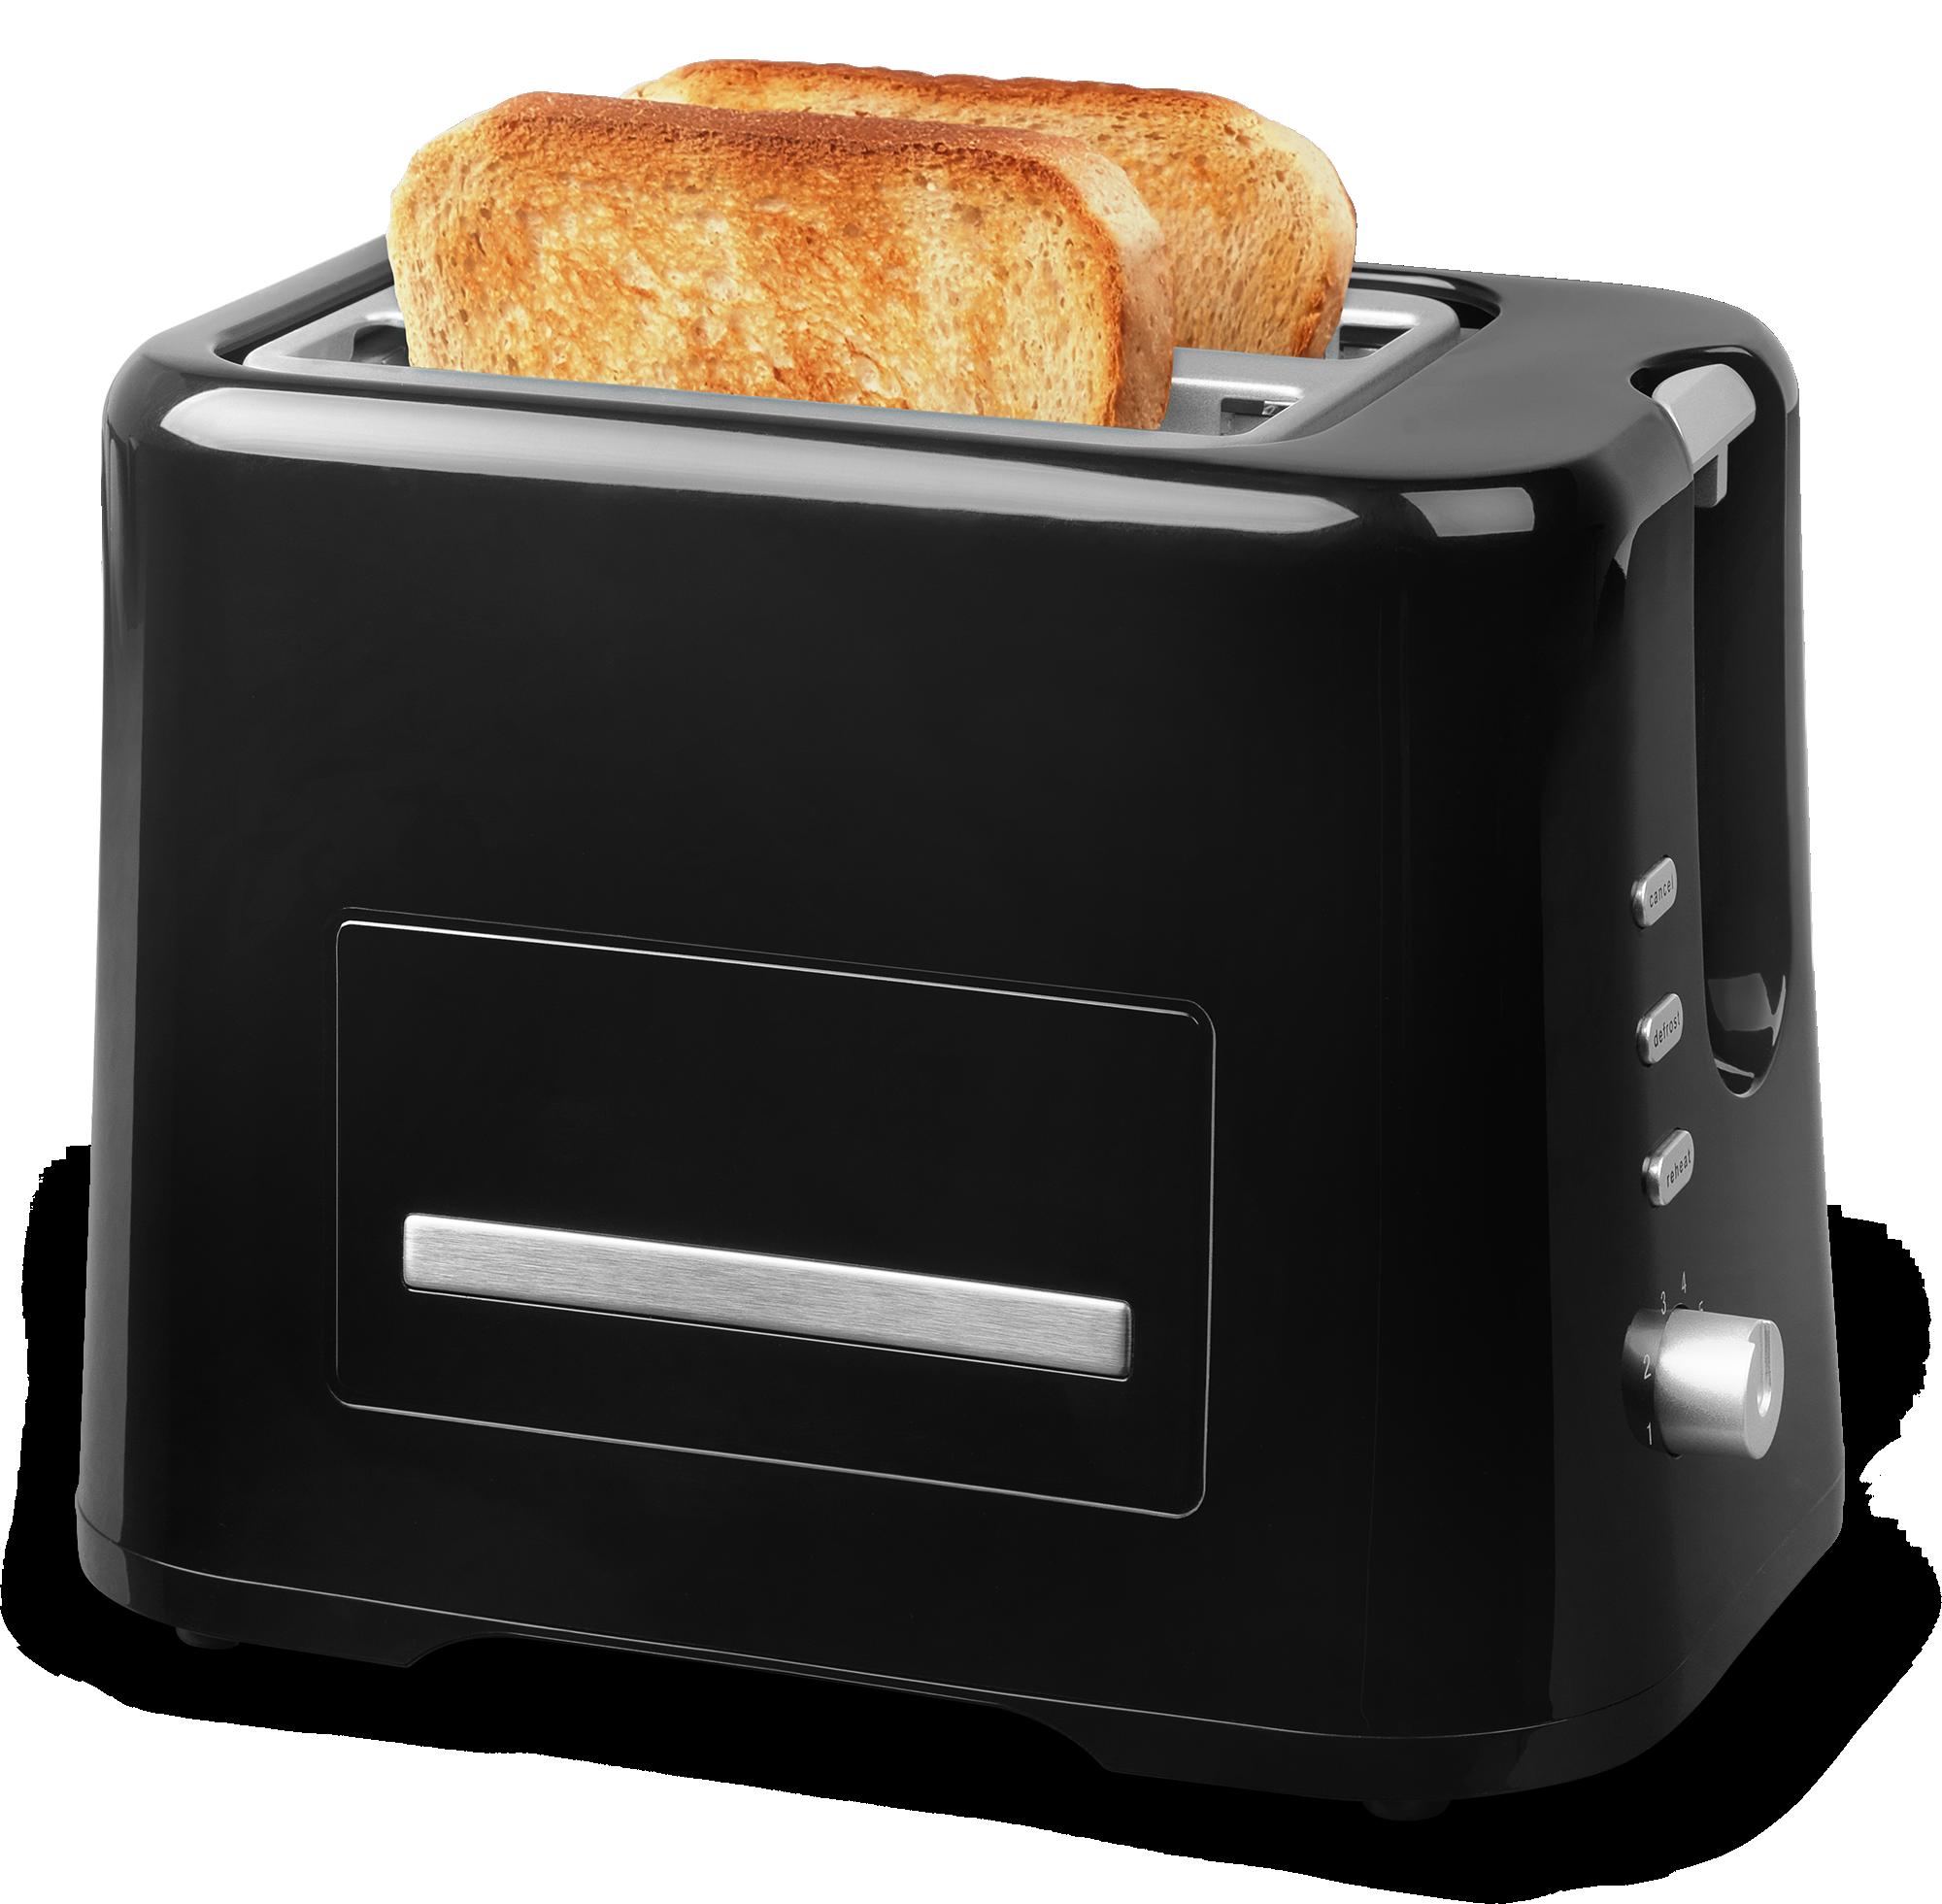 Medion compacte instap toaster